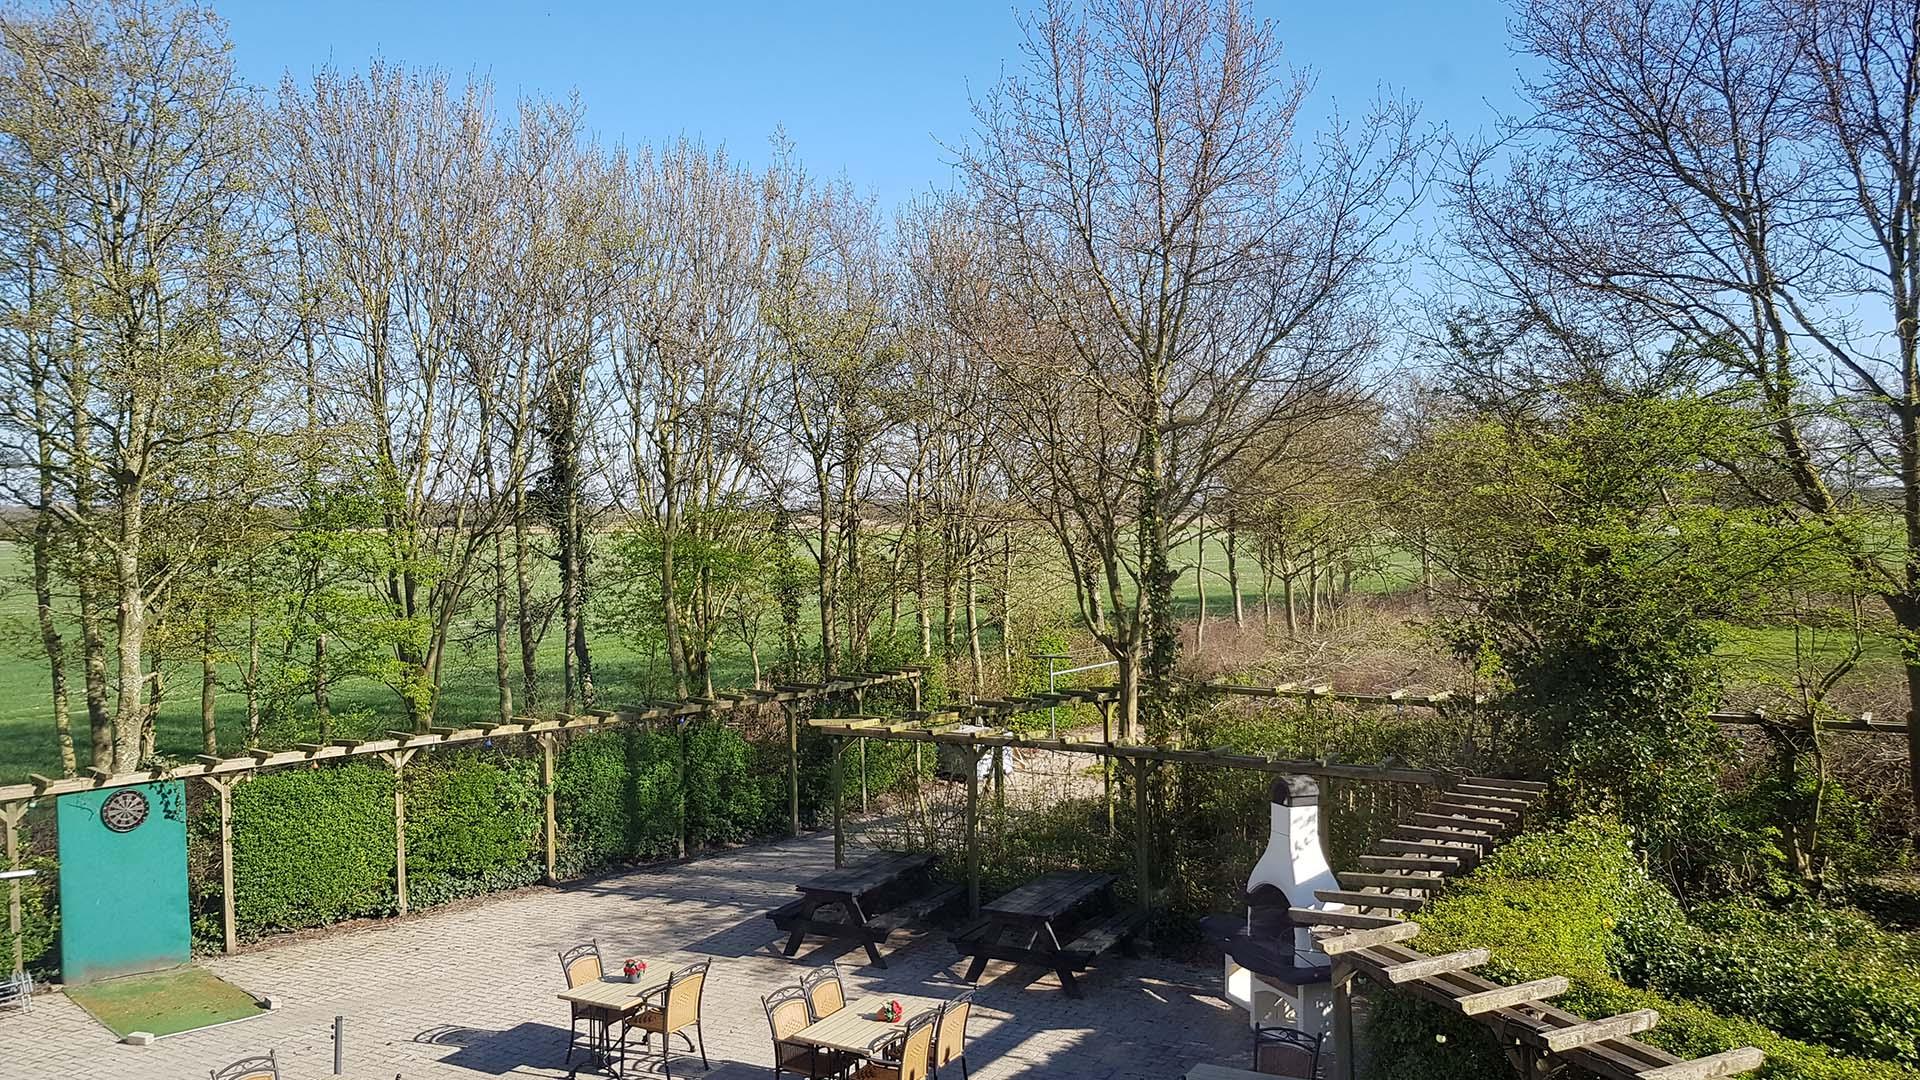 kamer 3 uitzicht terras B&B Plompetorenzicht Burg-Haamstede Zeeland